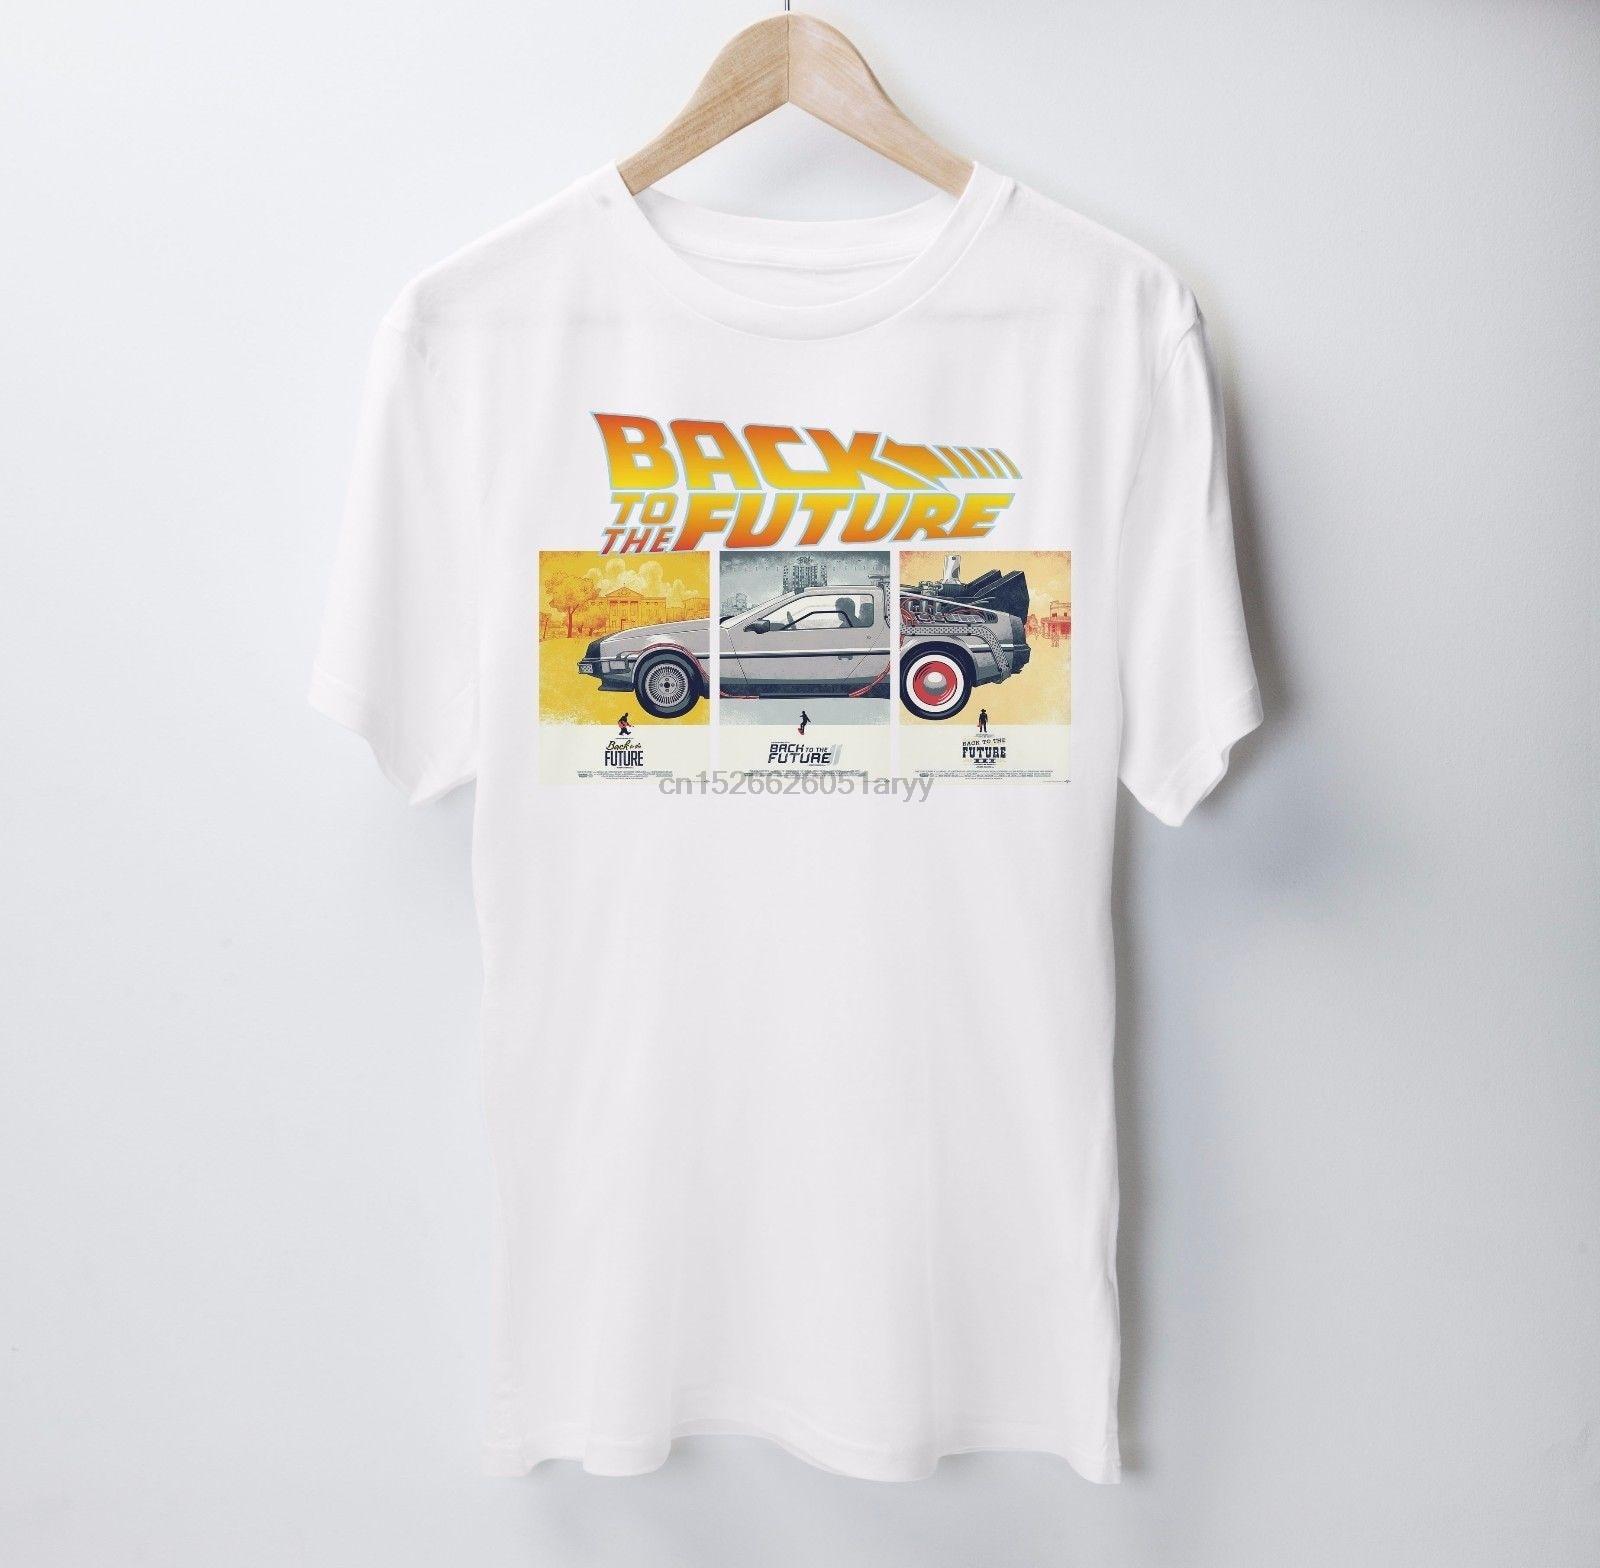 Camiseta de vuelta al futuro Michael J. Camisetas de manga corta de algodón con cuello redondo con 100% de regalo de zorro Cristóbal Nerd Geek